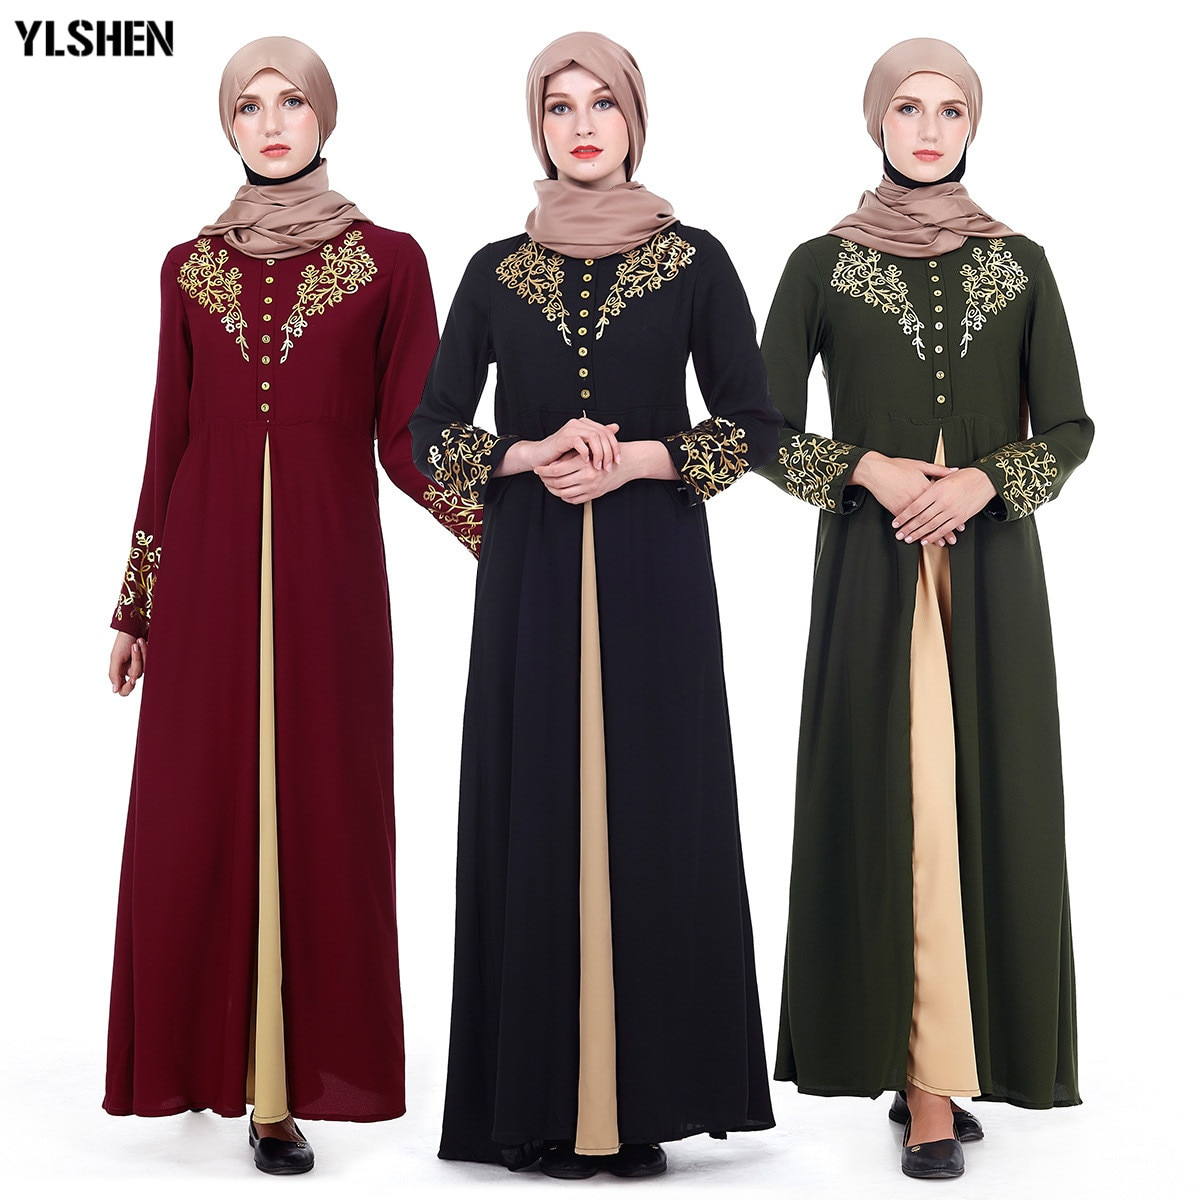 Grande taille musulmane Abaya dubaï femmes Maxi robes Ramadan Moslim Robe de prière Hijab Robe caftan islamique turquie vêtements islamiques